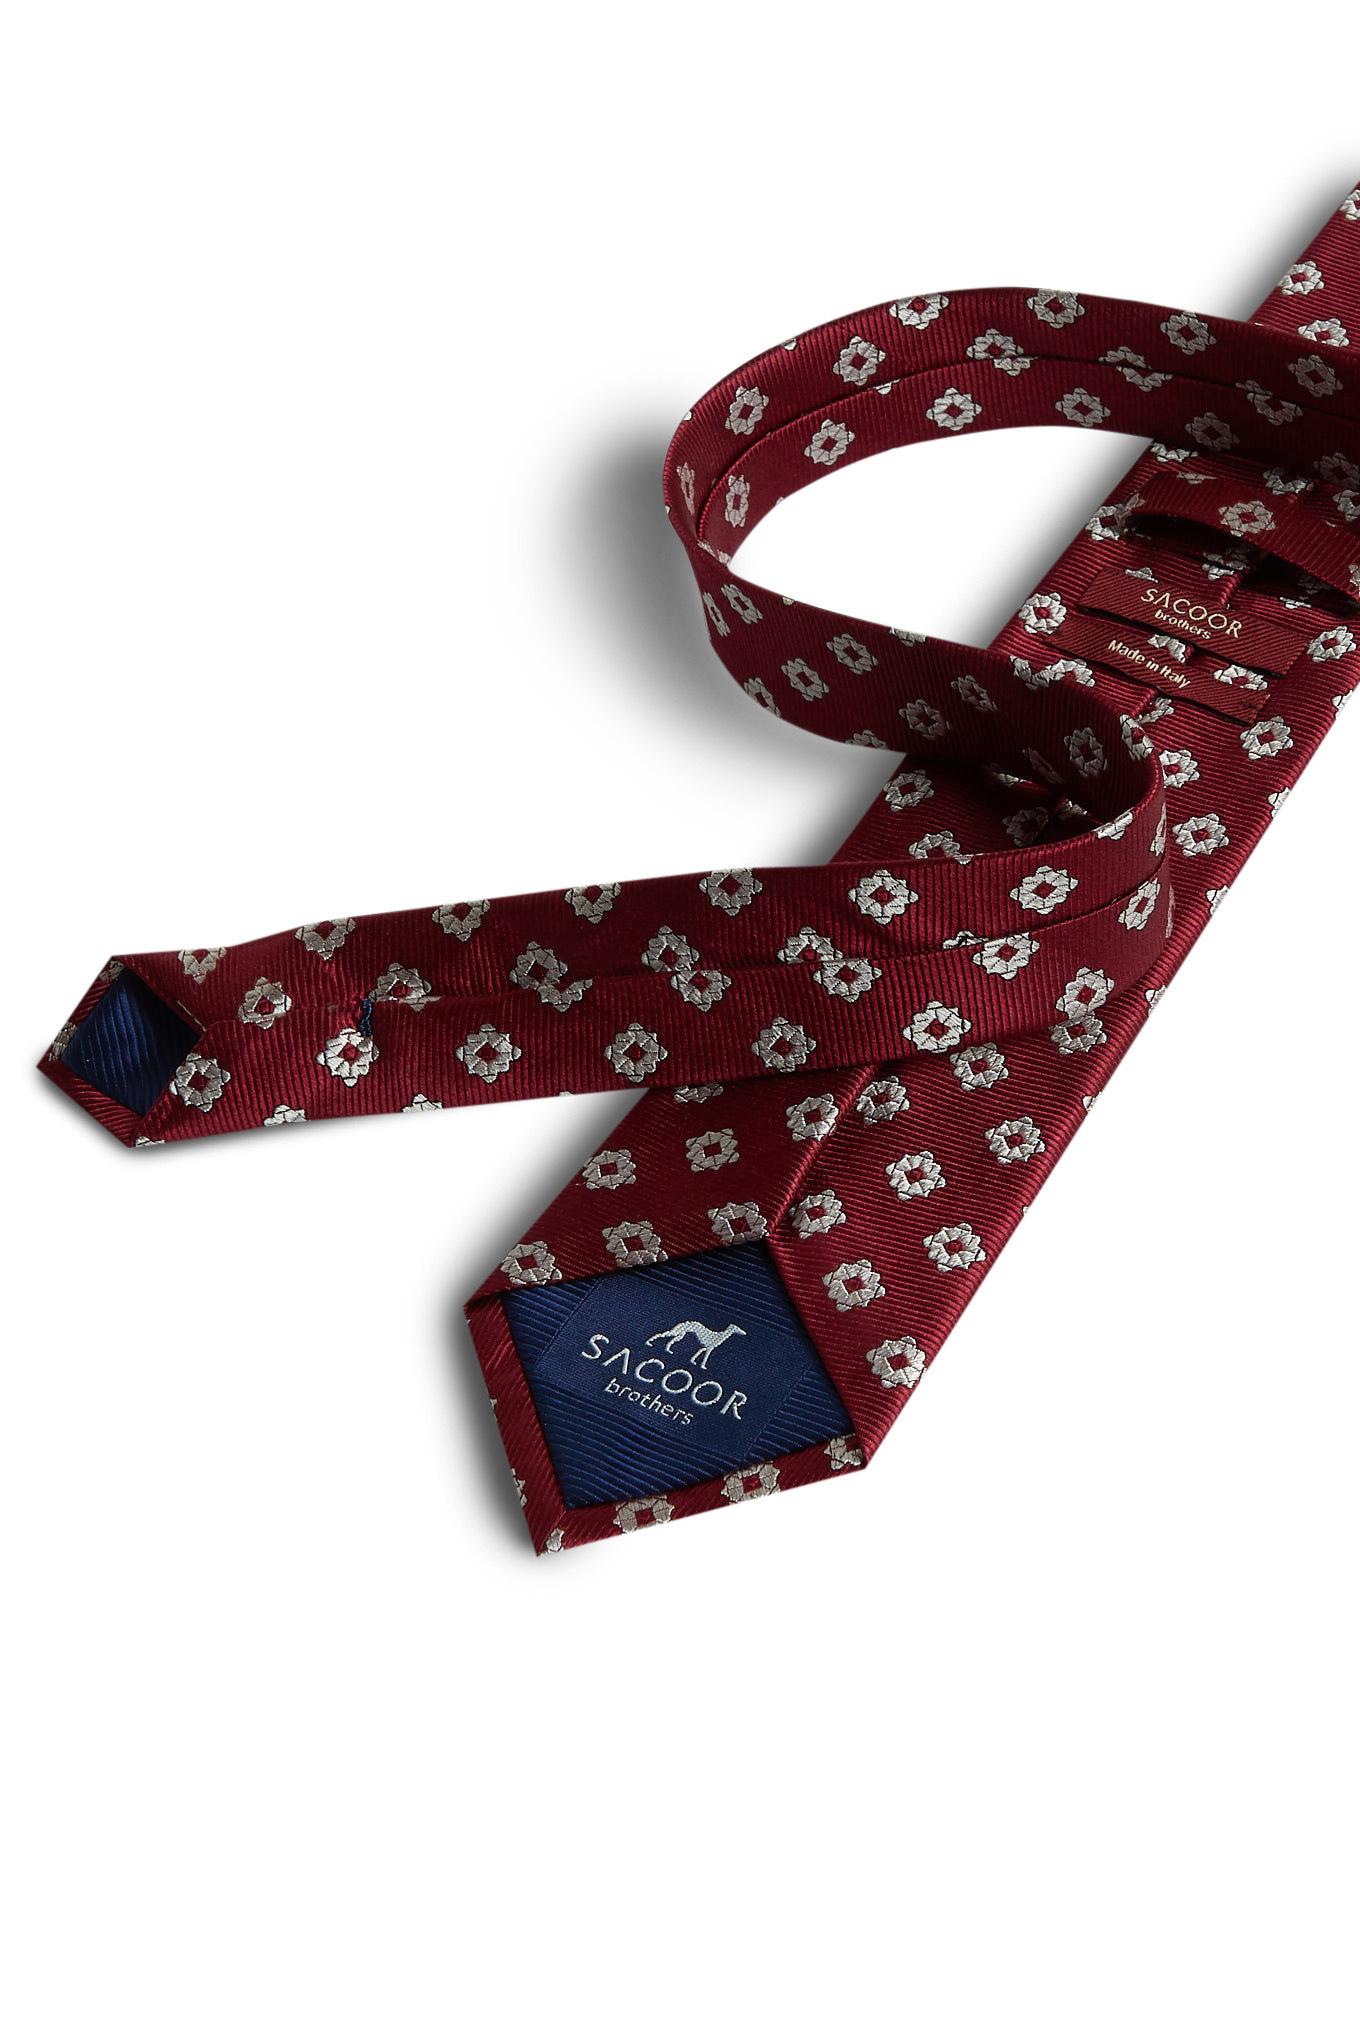 Tie Dark Red Formal Man